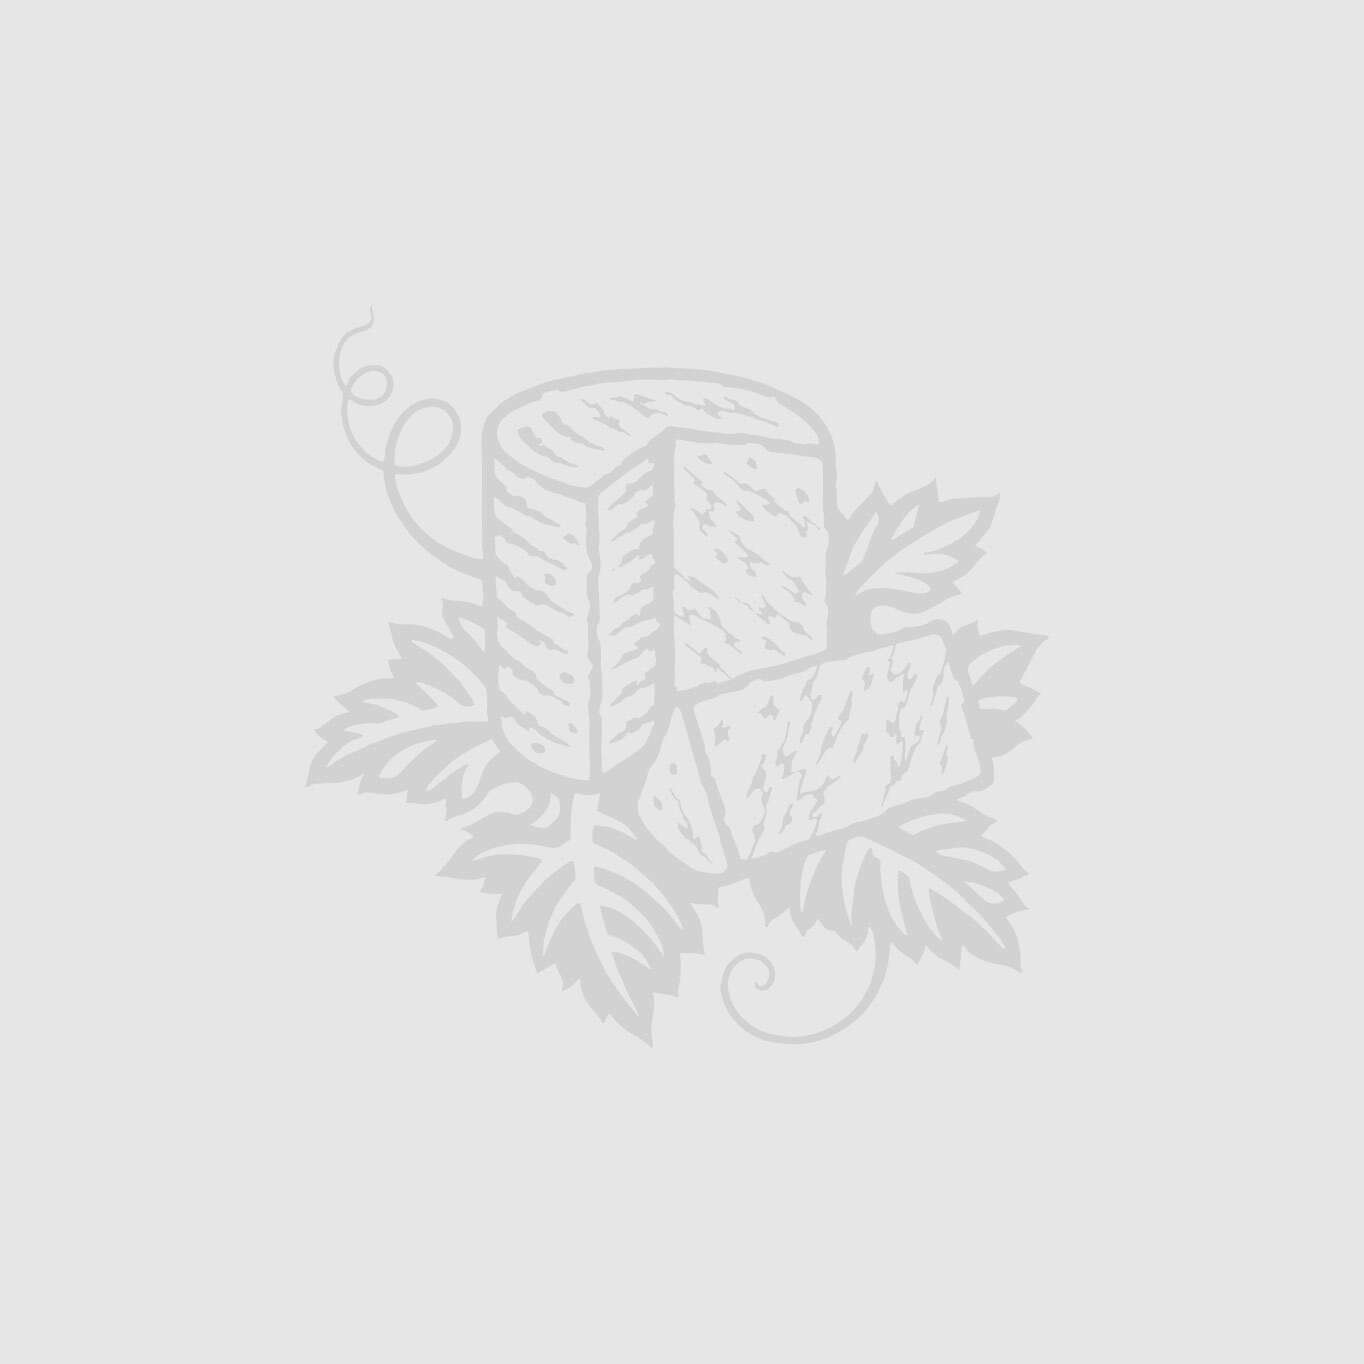 5 x The Fine Cheese Co. Parmigiano-Reggiano Crackers